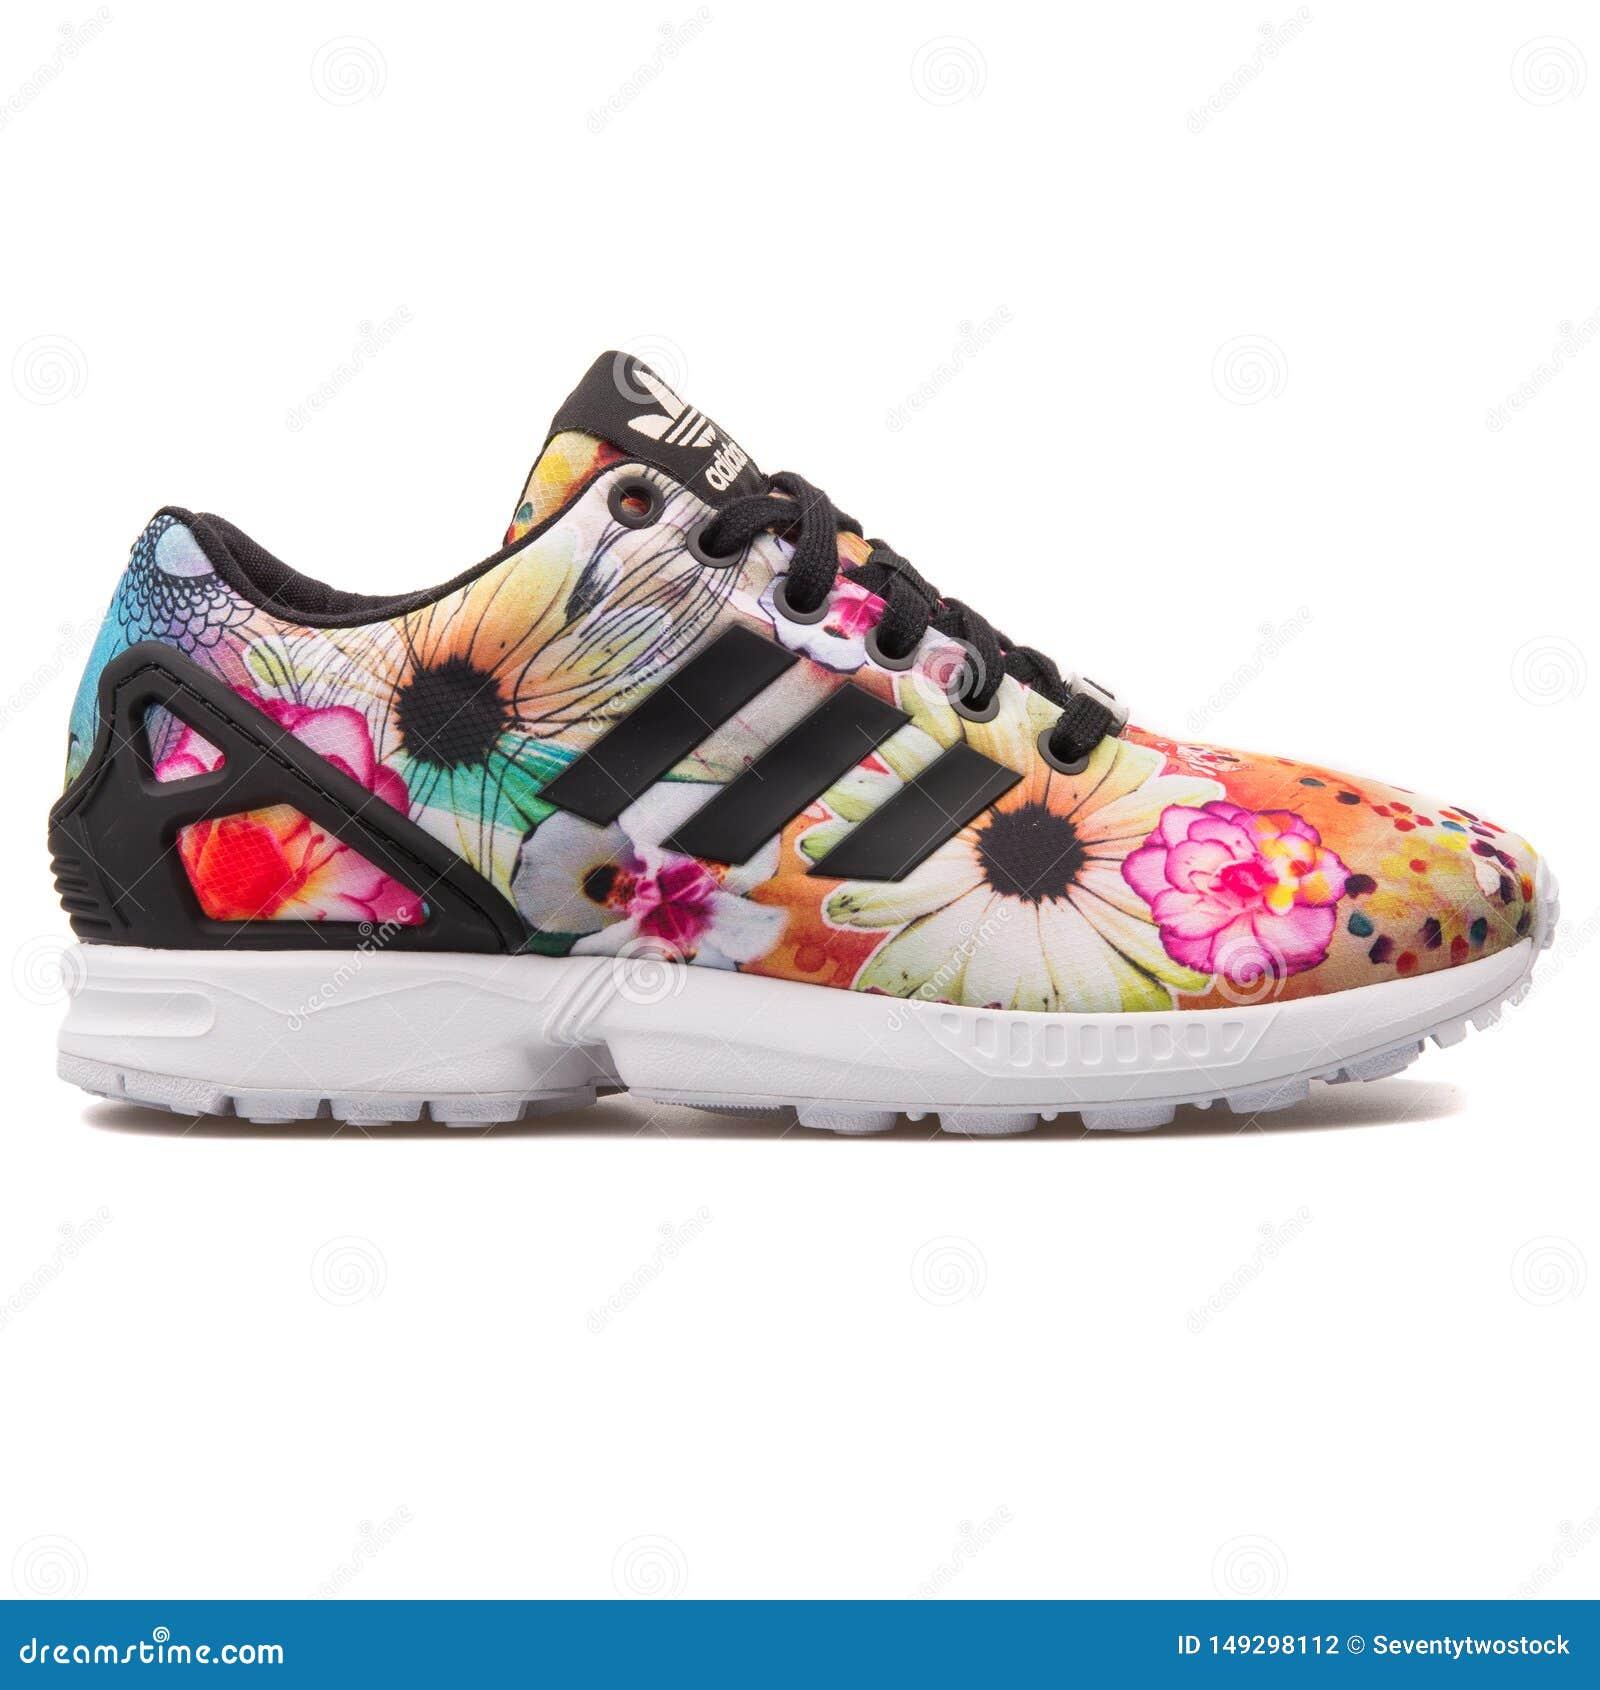 adidas zx flux floral